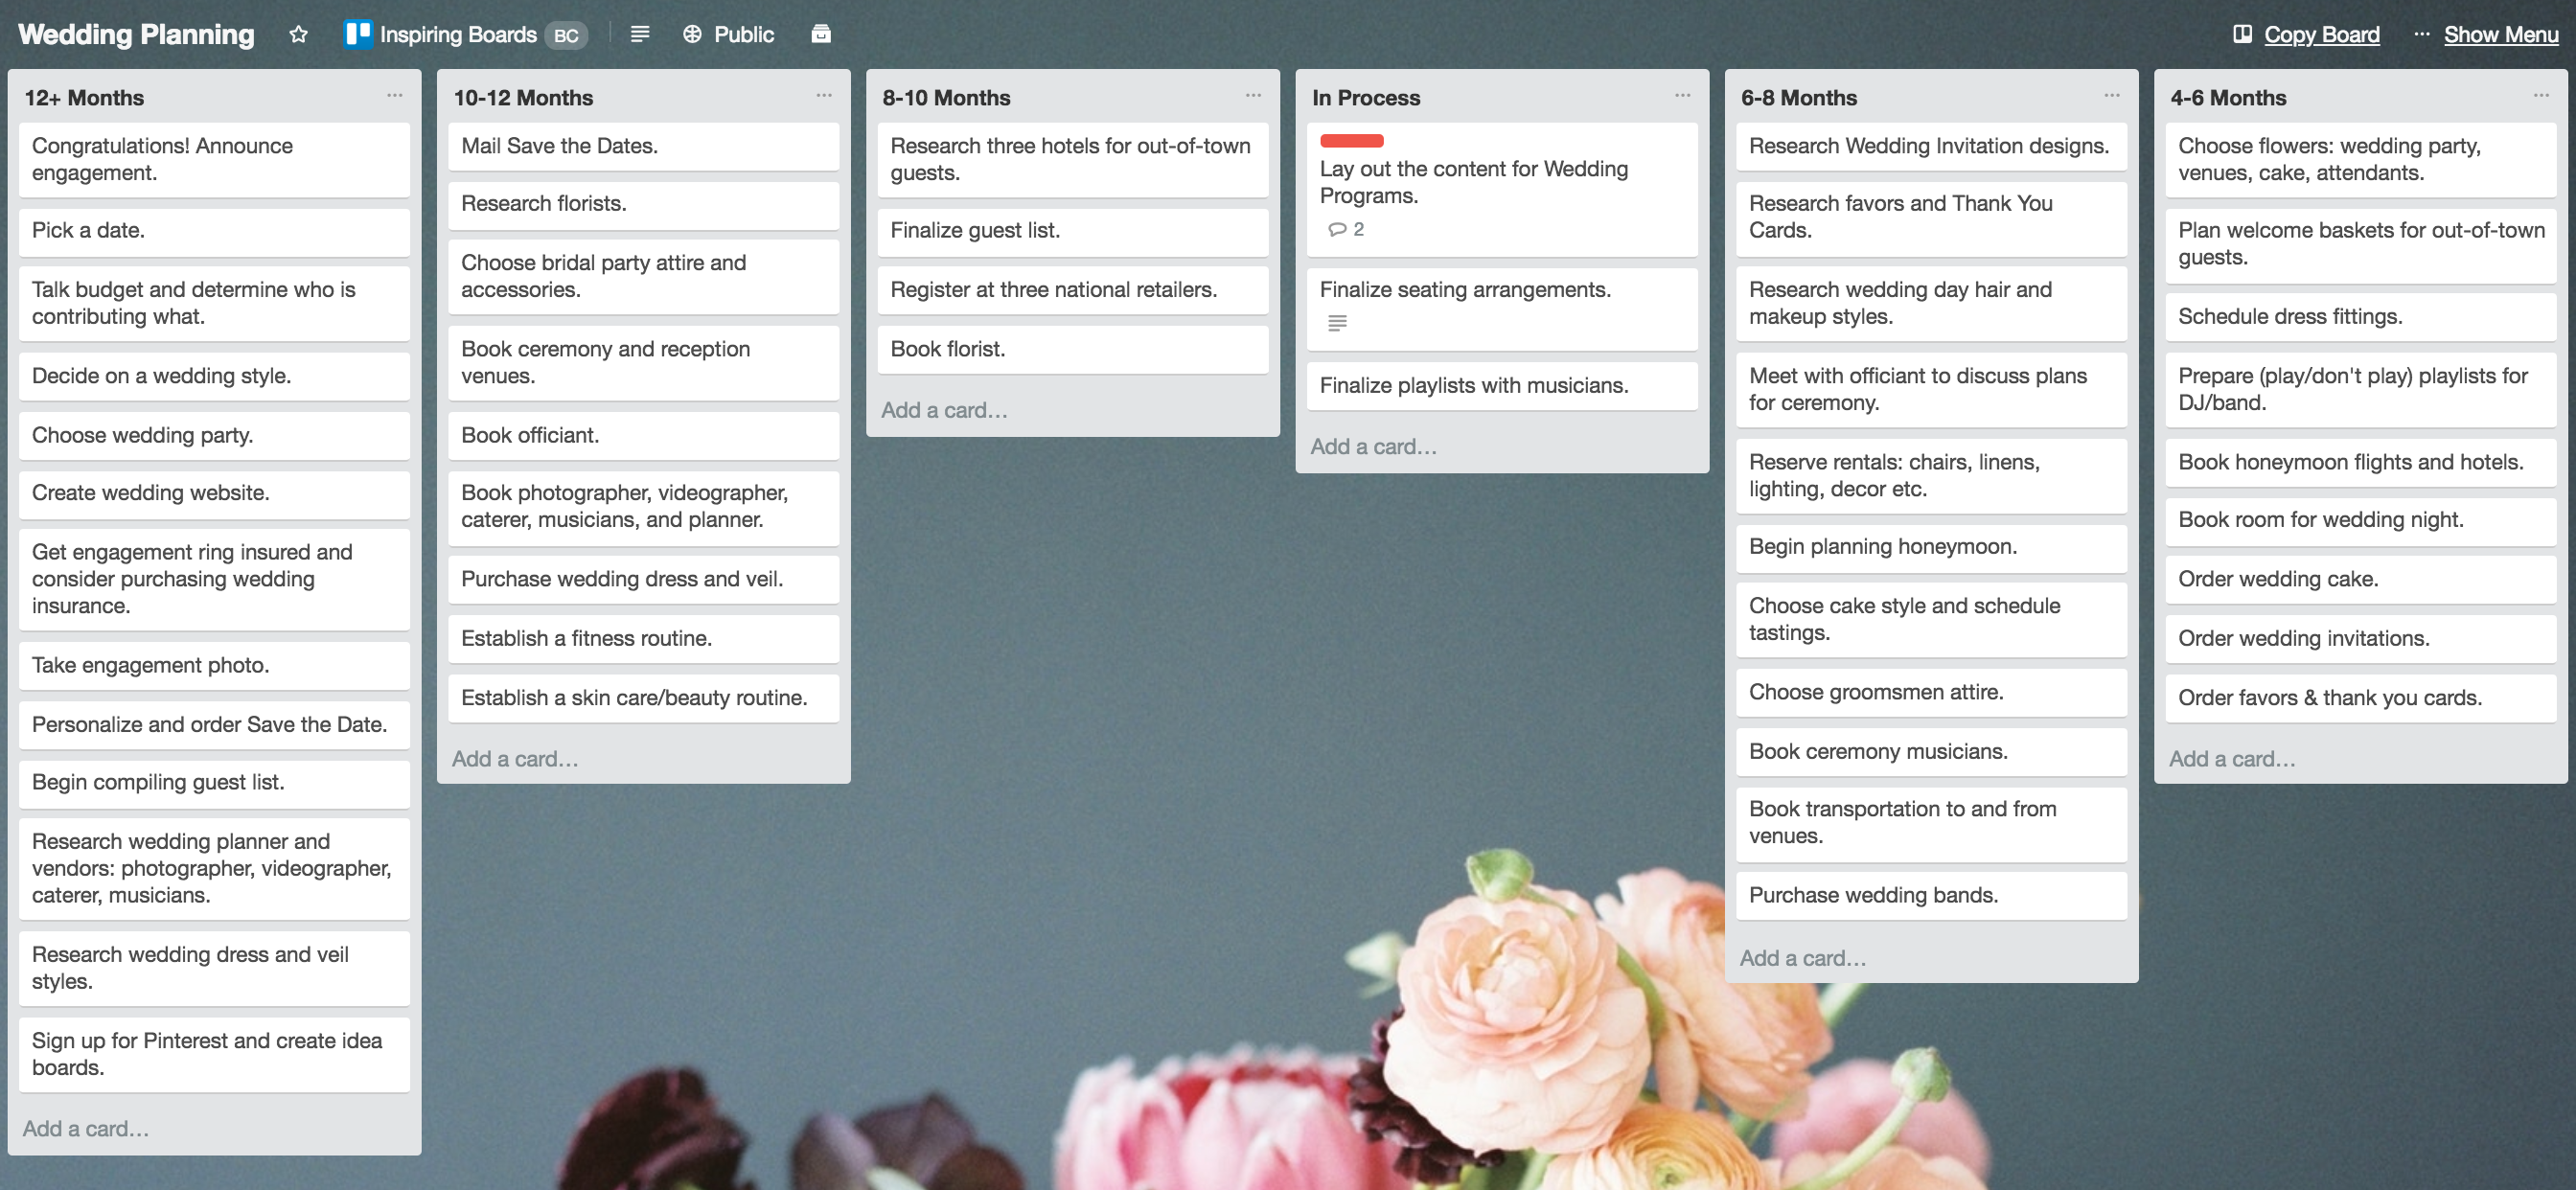 Wedding Planning Master List Template